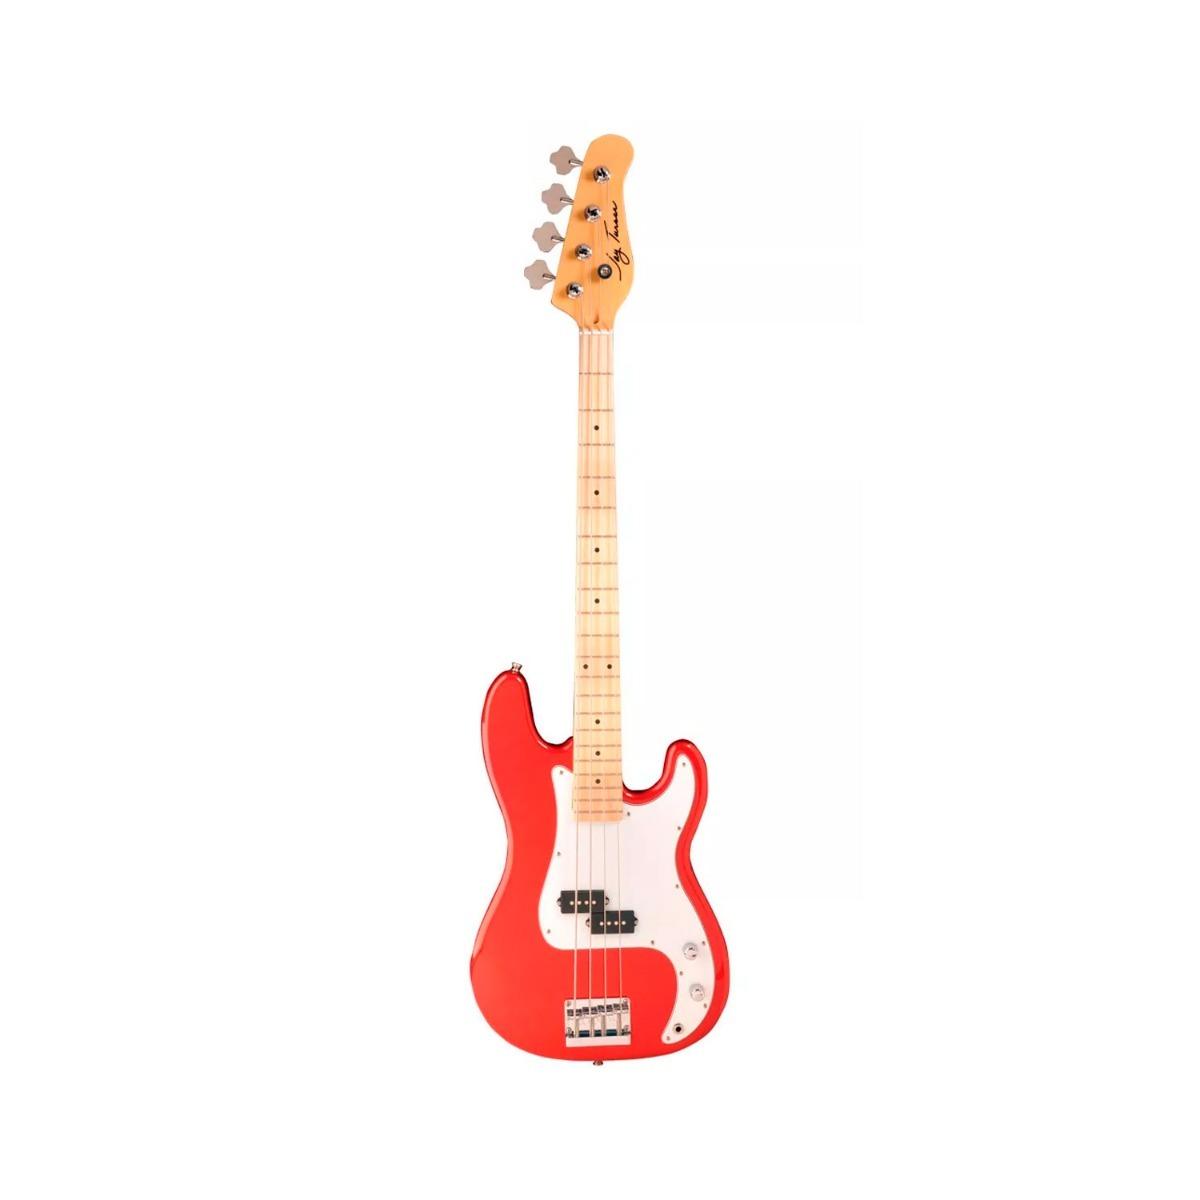 JB x Precision Baixo-jay-turser-precision-bass-jtb-400m-car-D_NQ_NP_914917-MLB29507867847_022019-F